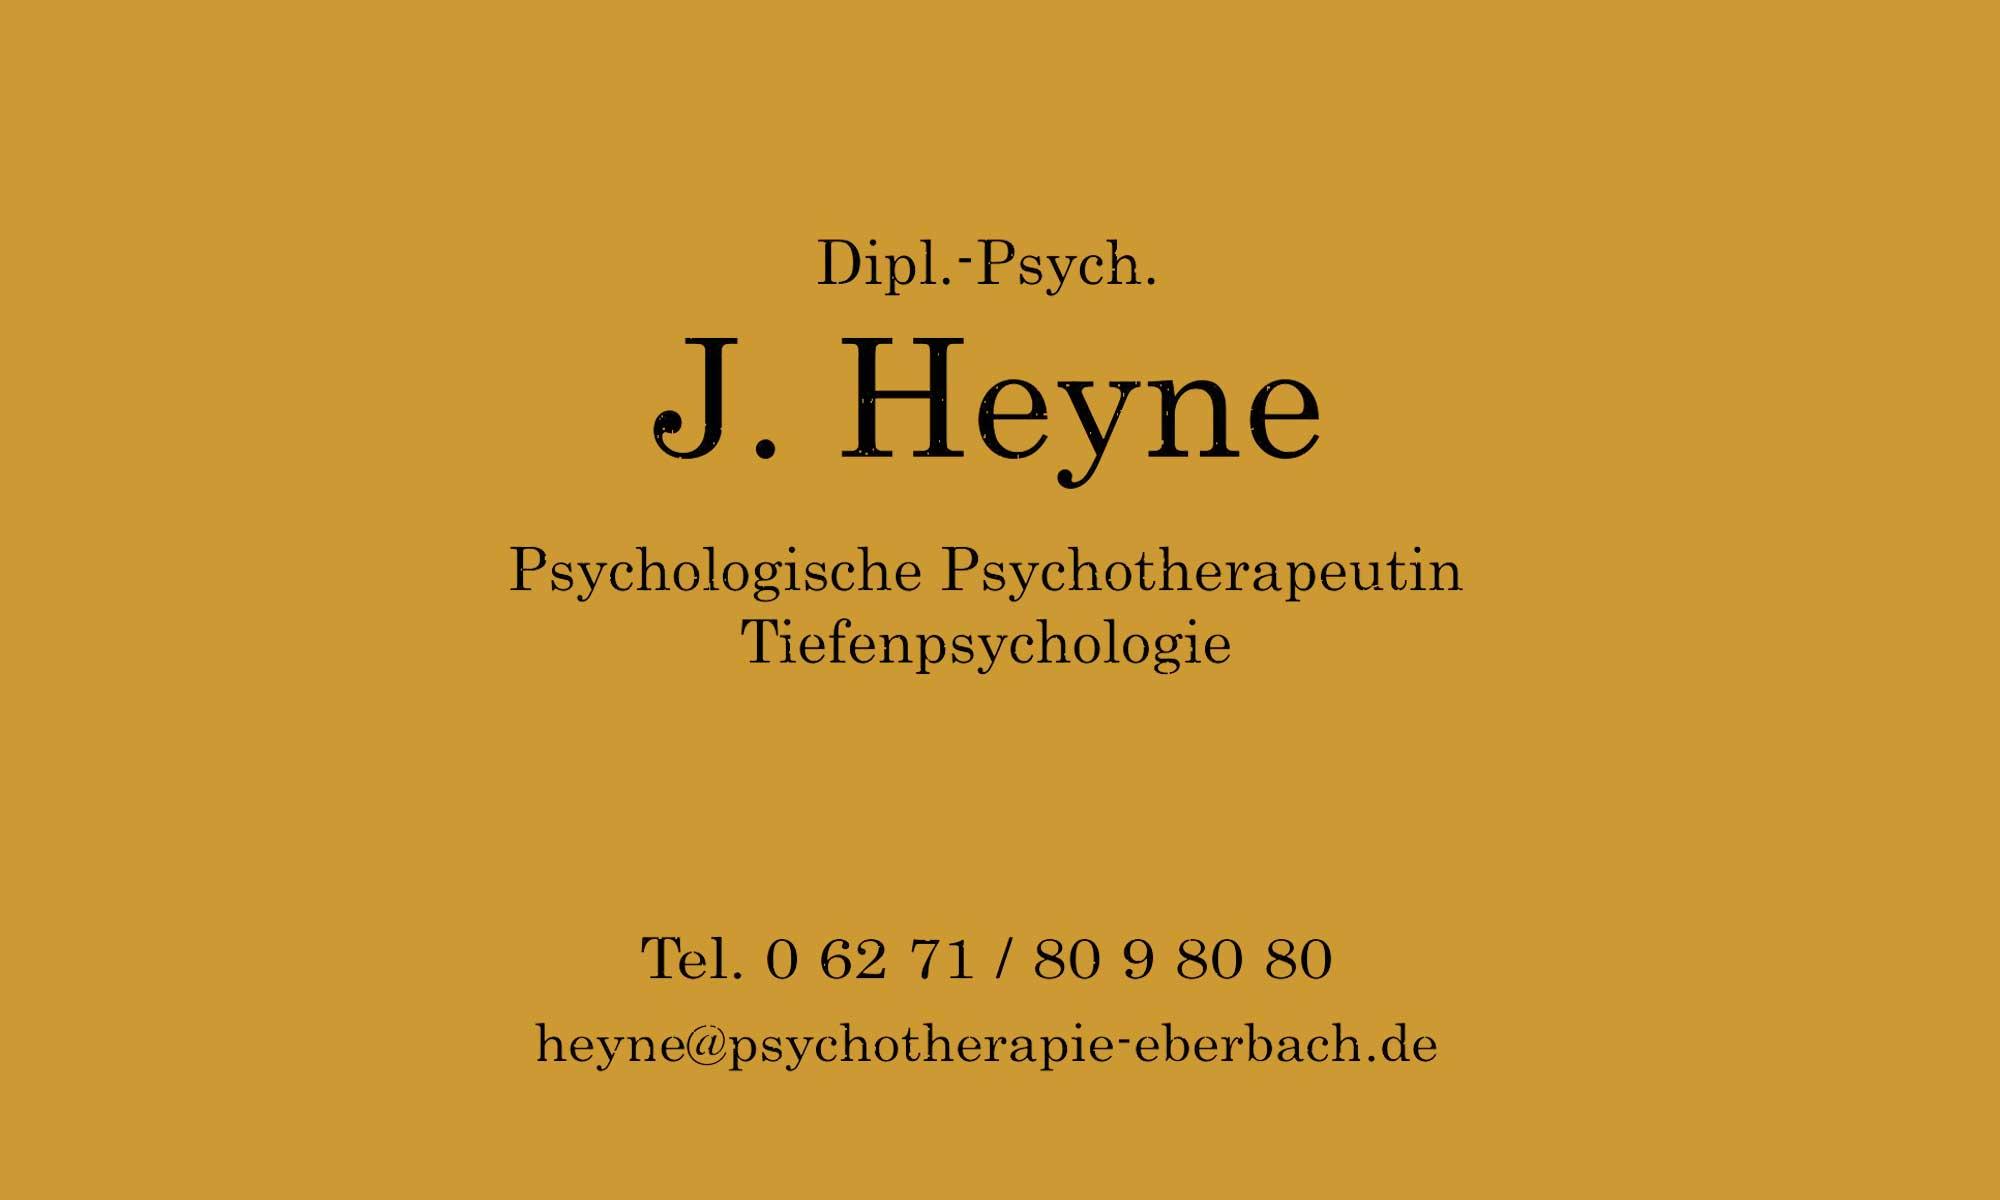 Dipl.-Psych. J. Heyne